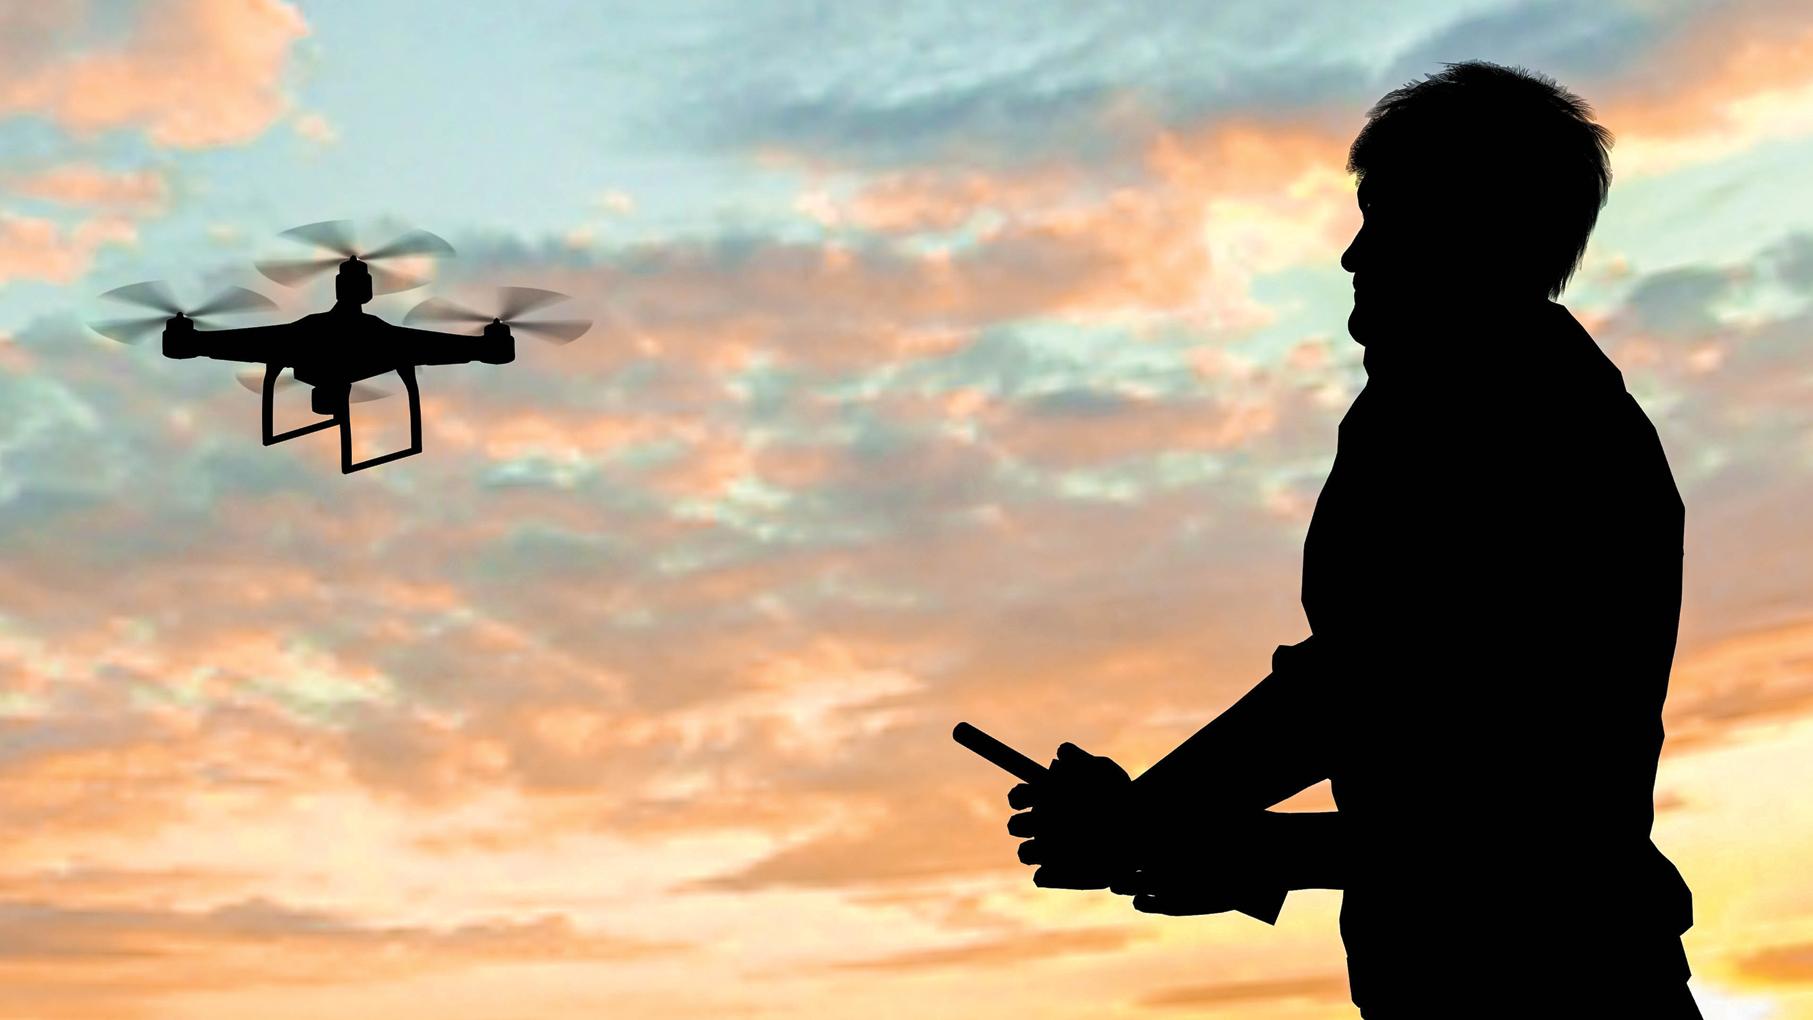 Drone pilot prep class available at BPCC   BIZ - Northwest Louisiana